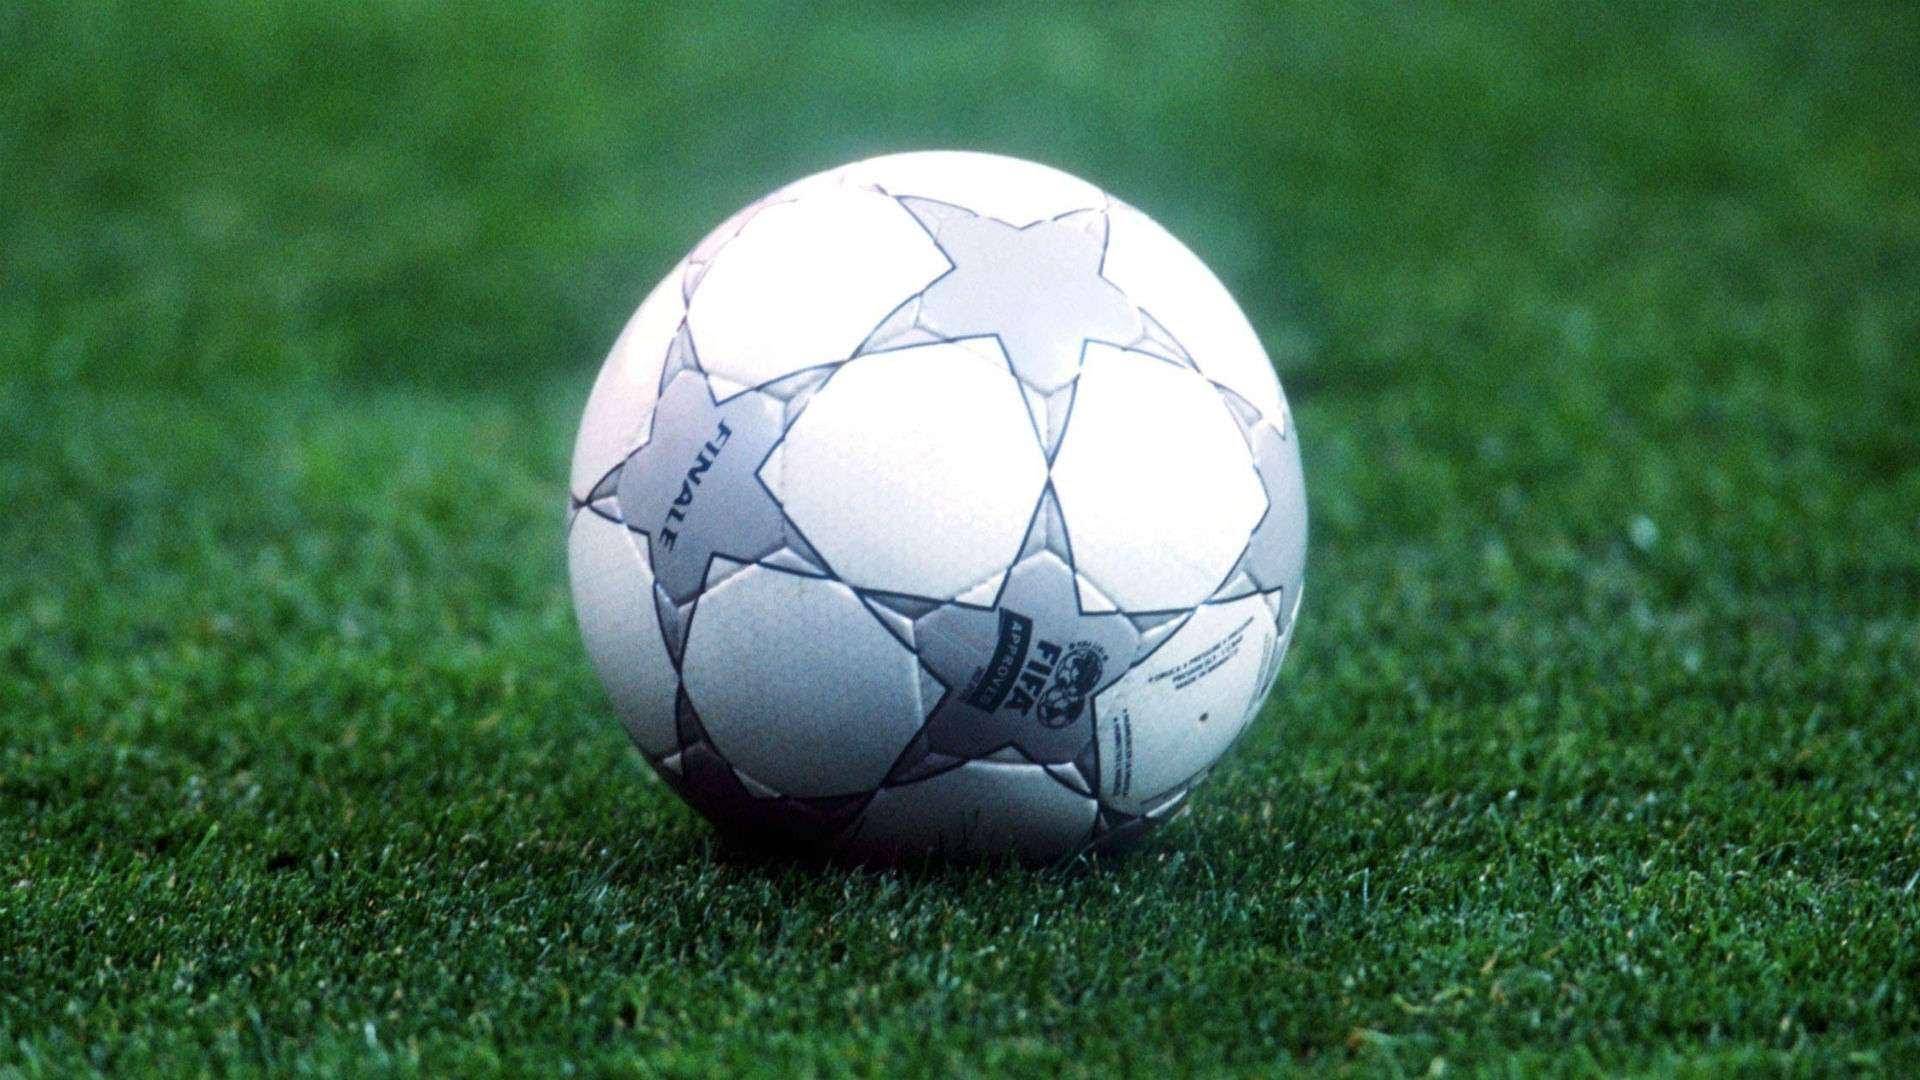 Adidas Finale Champions League ball 2000-01